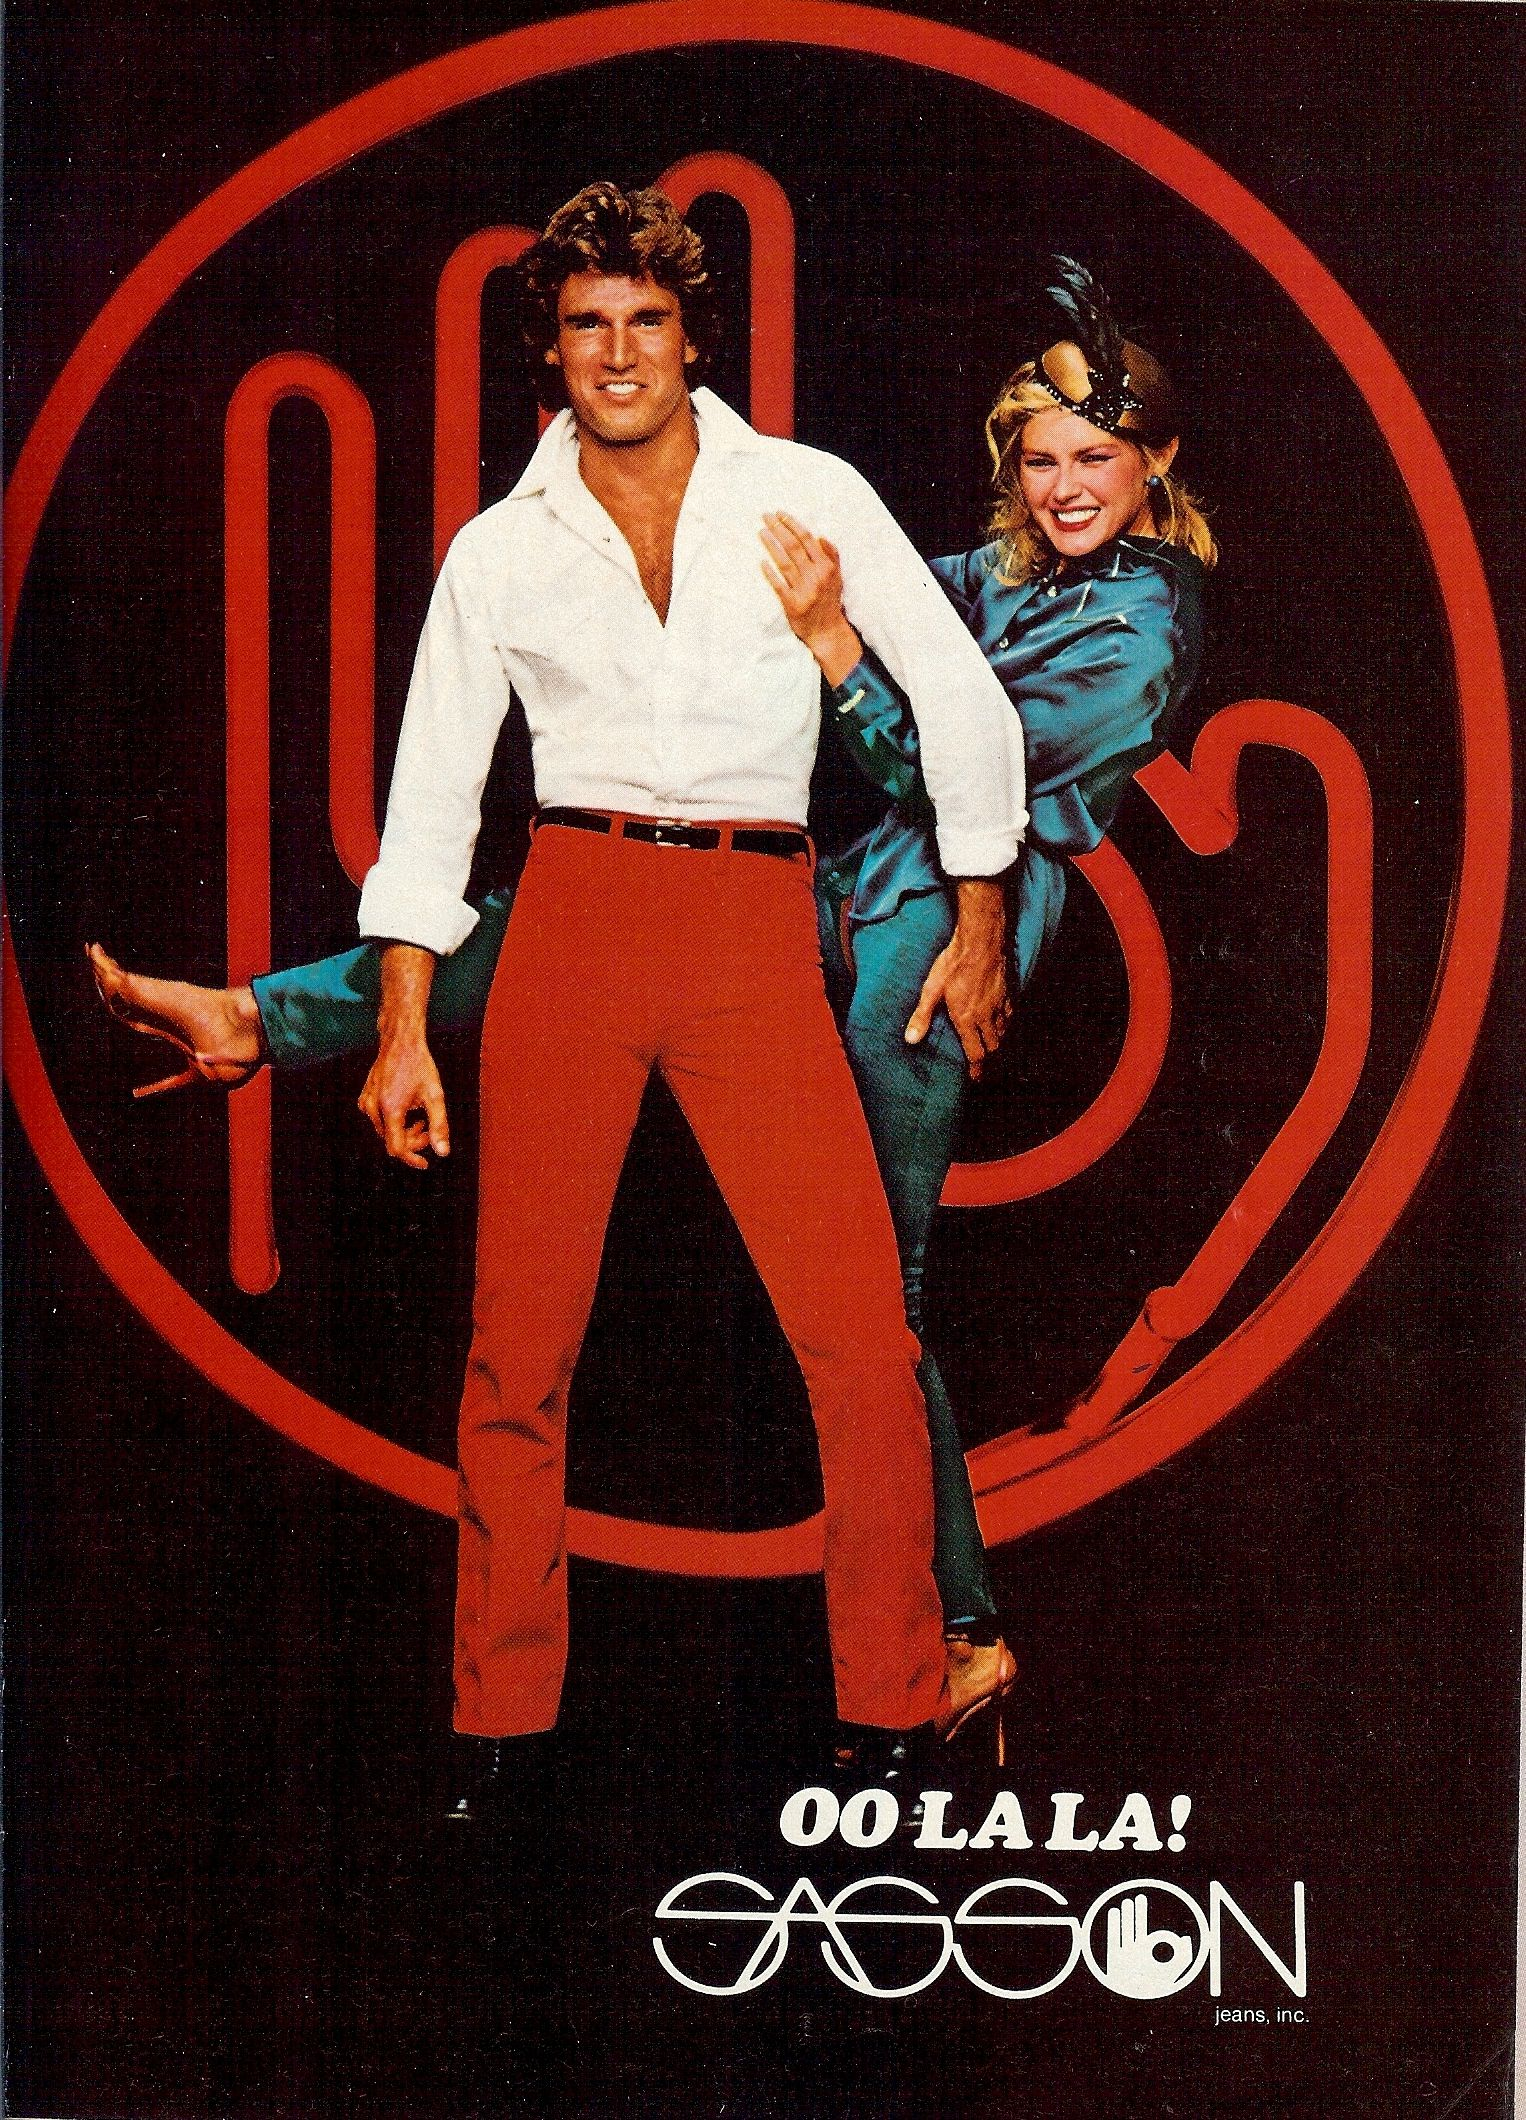 Sasson Jeans (1979)